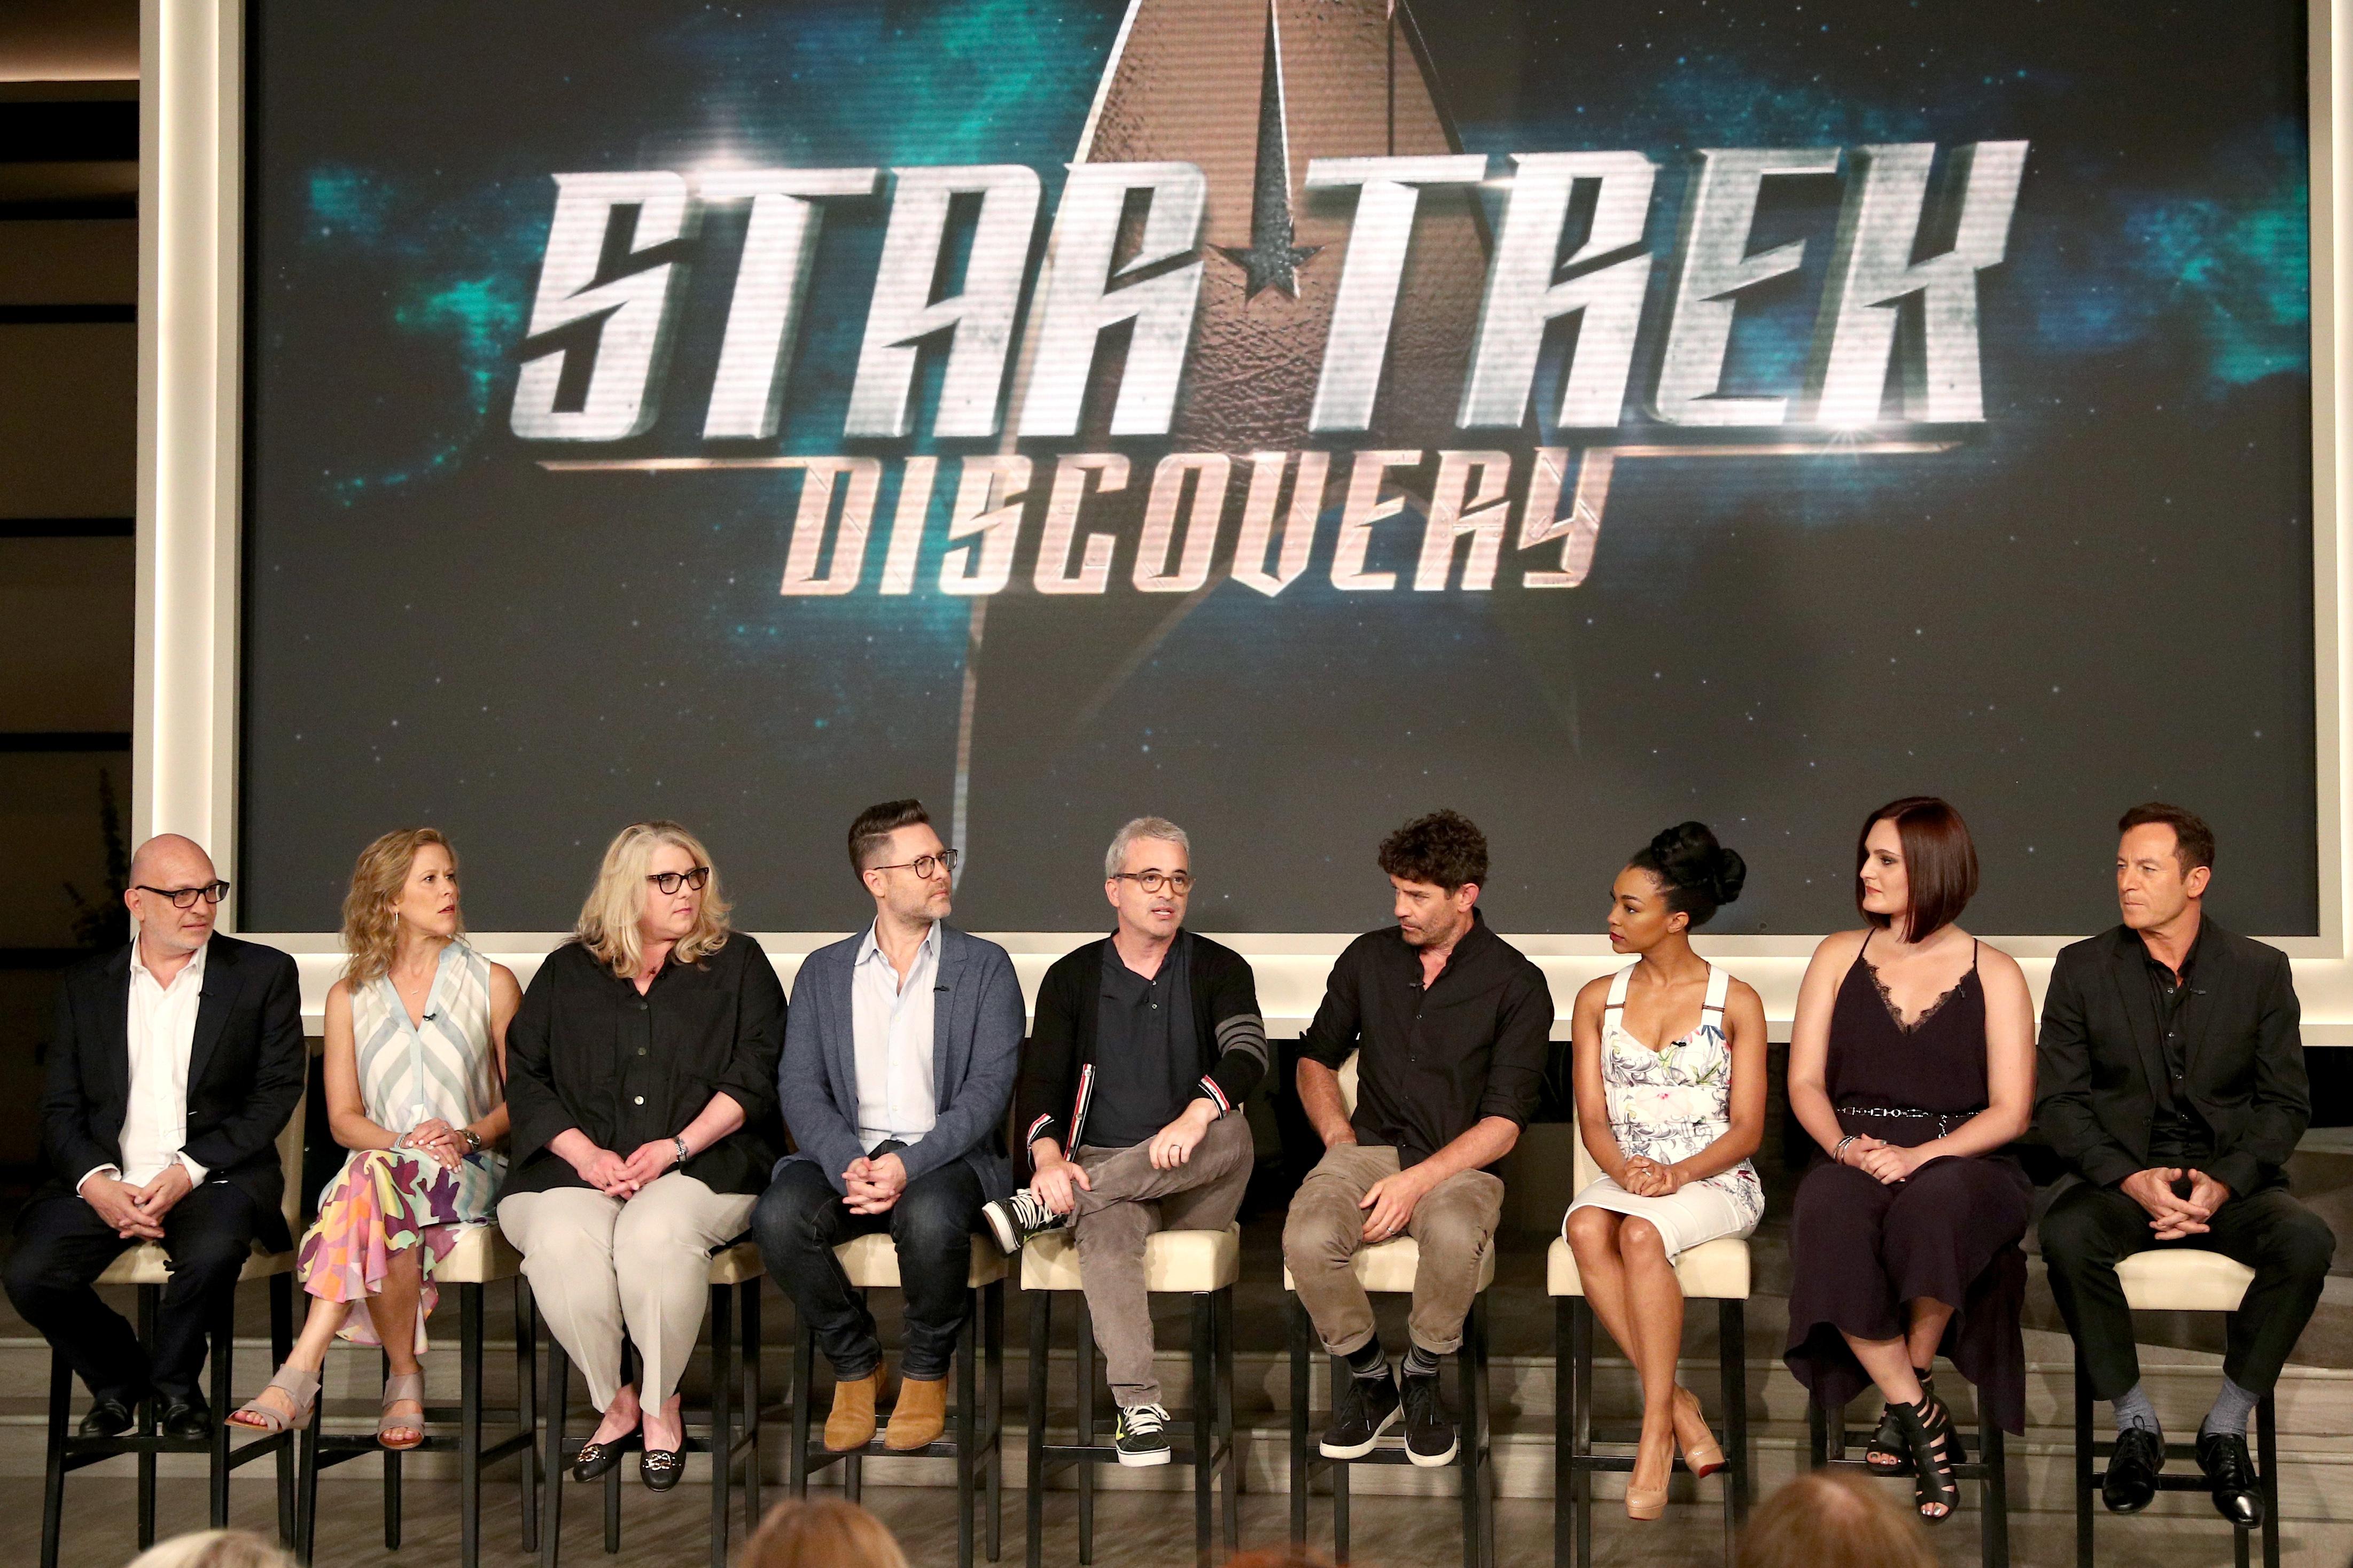 Jason Isaacs, James Frain, Akiva Goldsman, Aaron Harberts, Alex Kurtzman, Mary Chieffo, Heather Kadin, and Frederick M. Brown at an event for Star Trek: Discovery (2017)